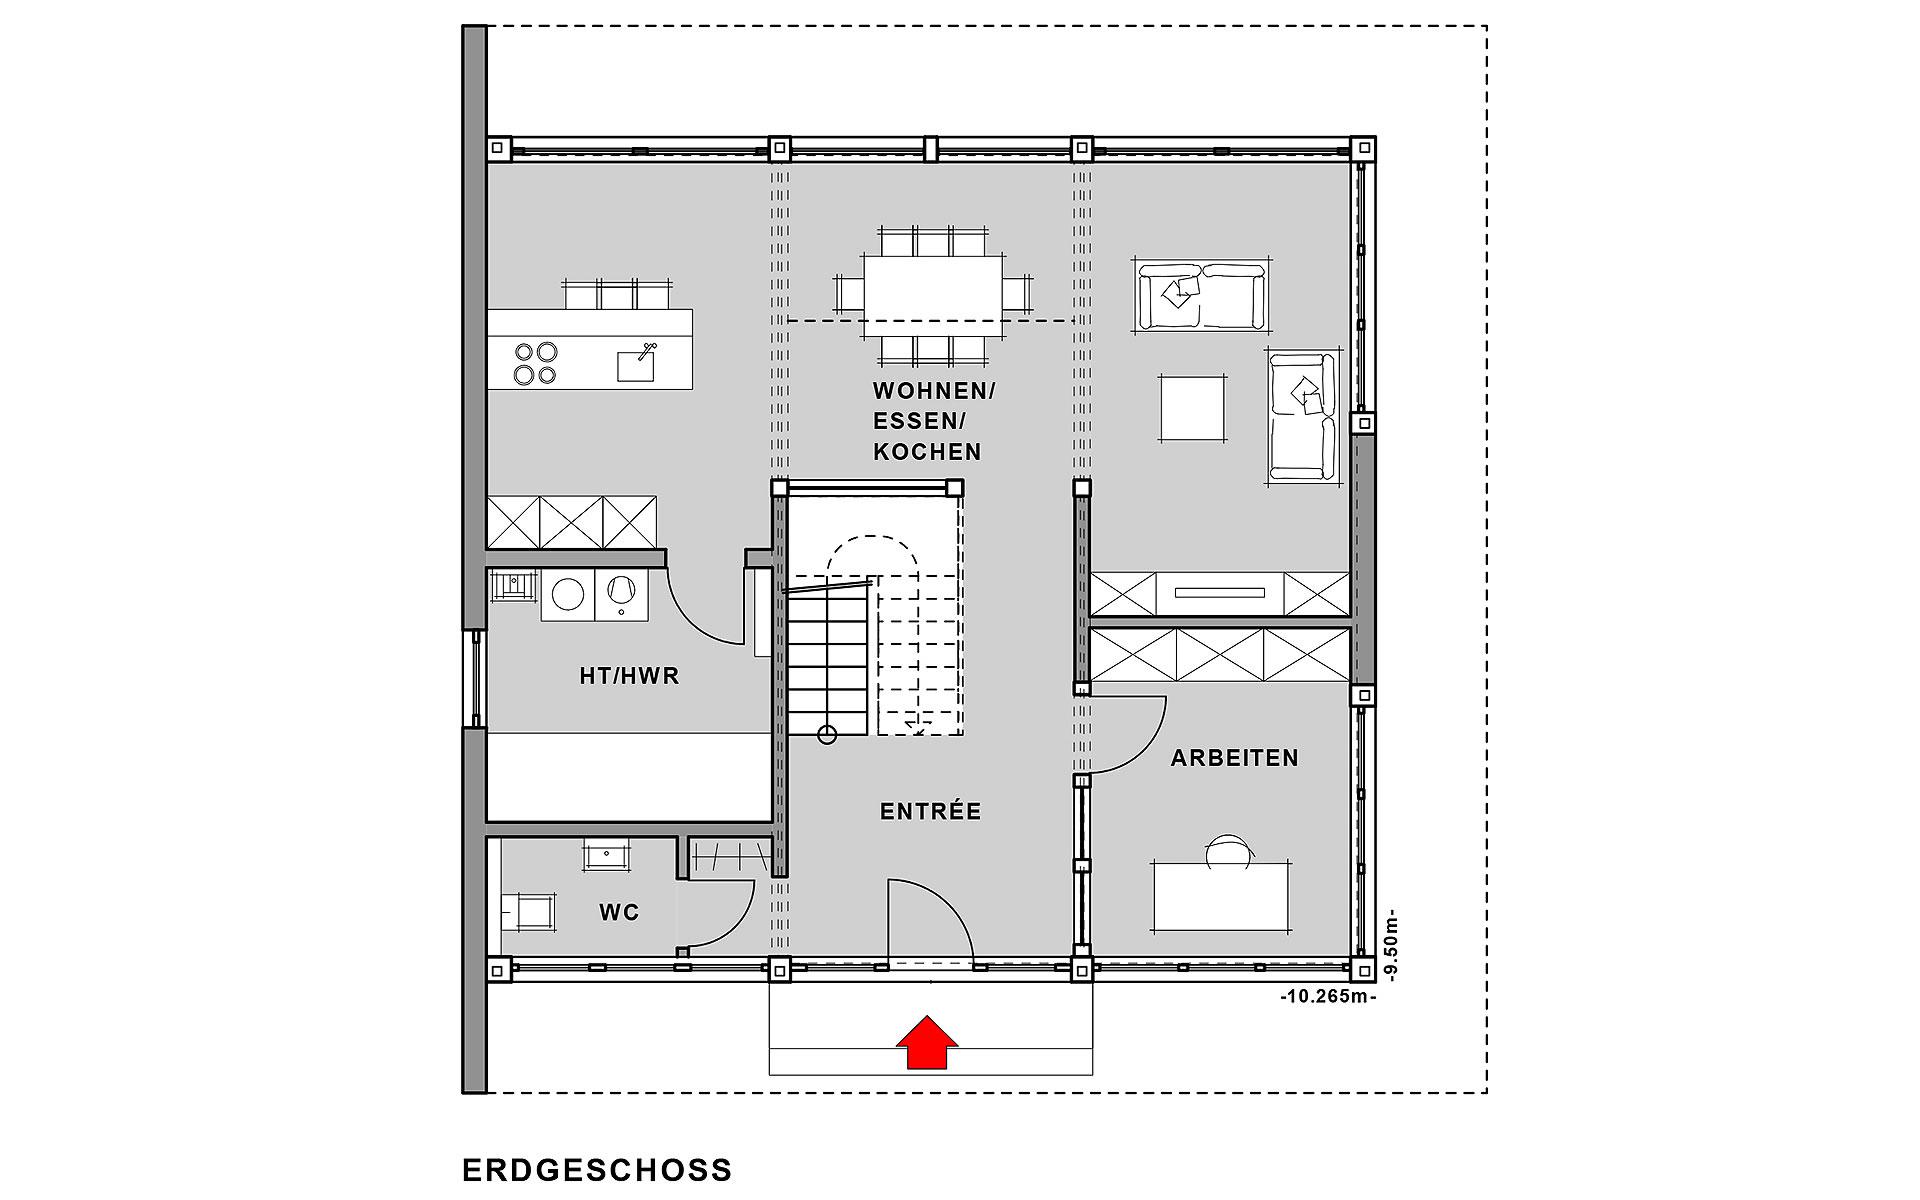 Erdgeschoss FUSION Musterhaus Mannheim von Meisterstück-HAUS